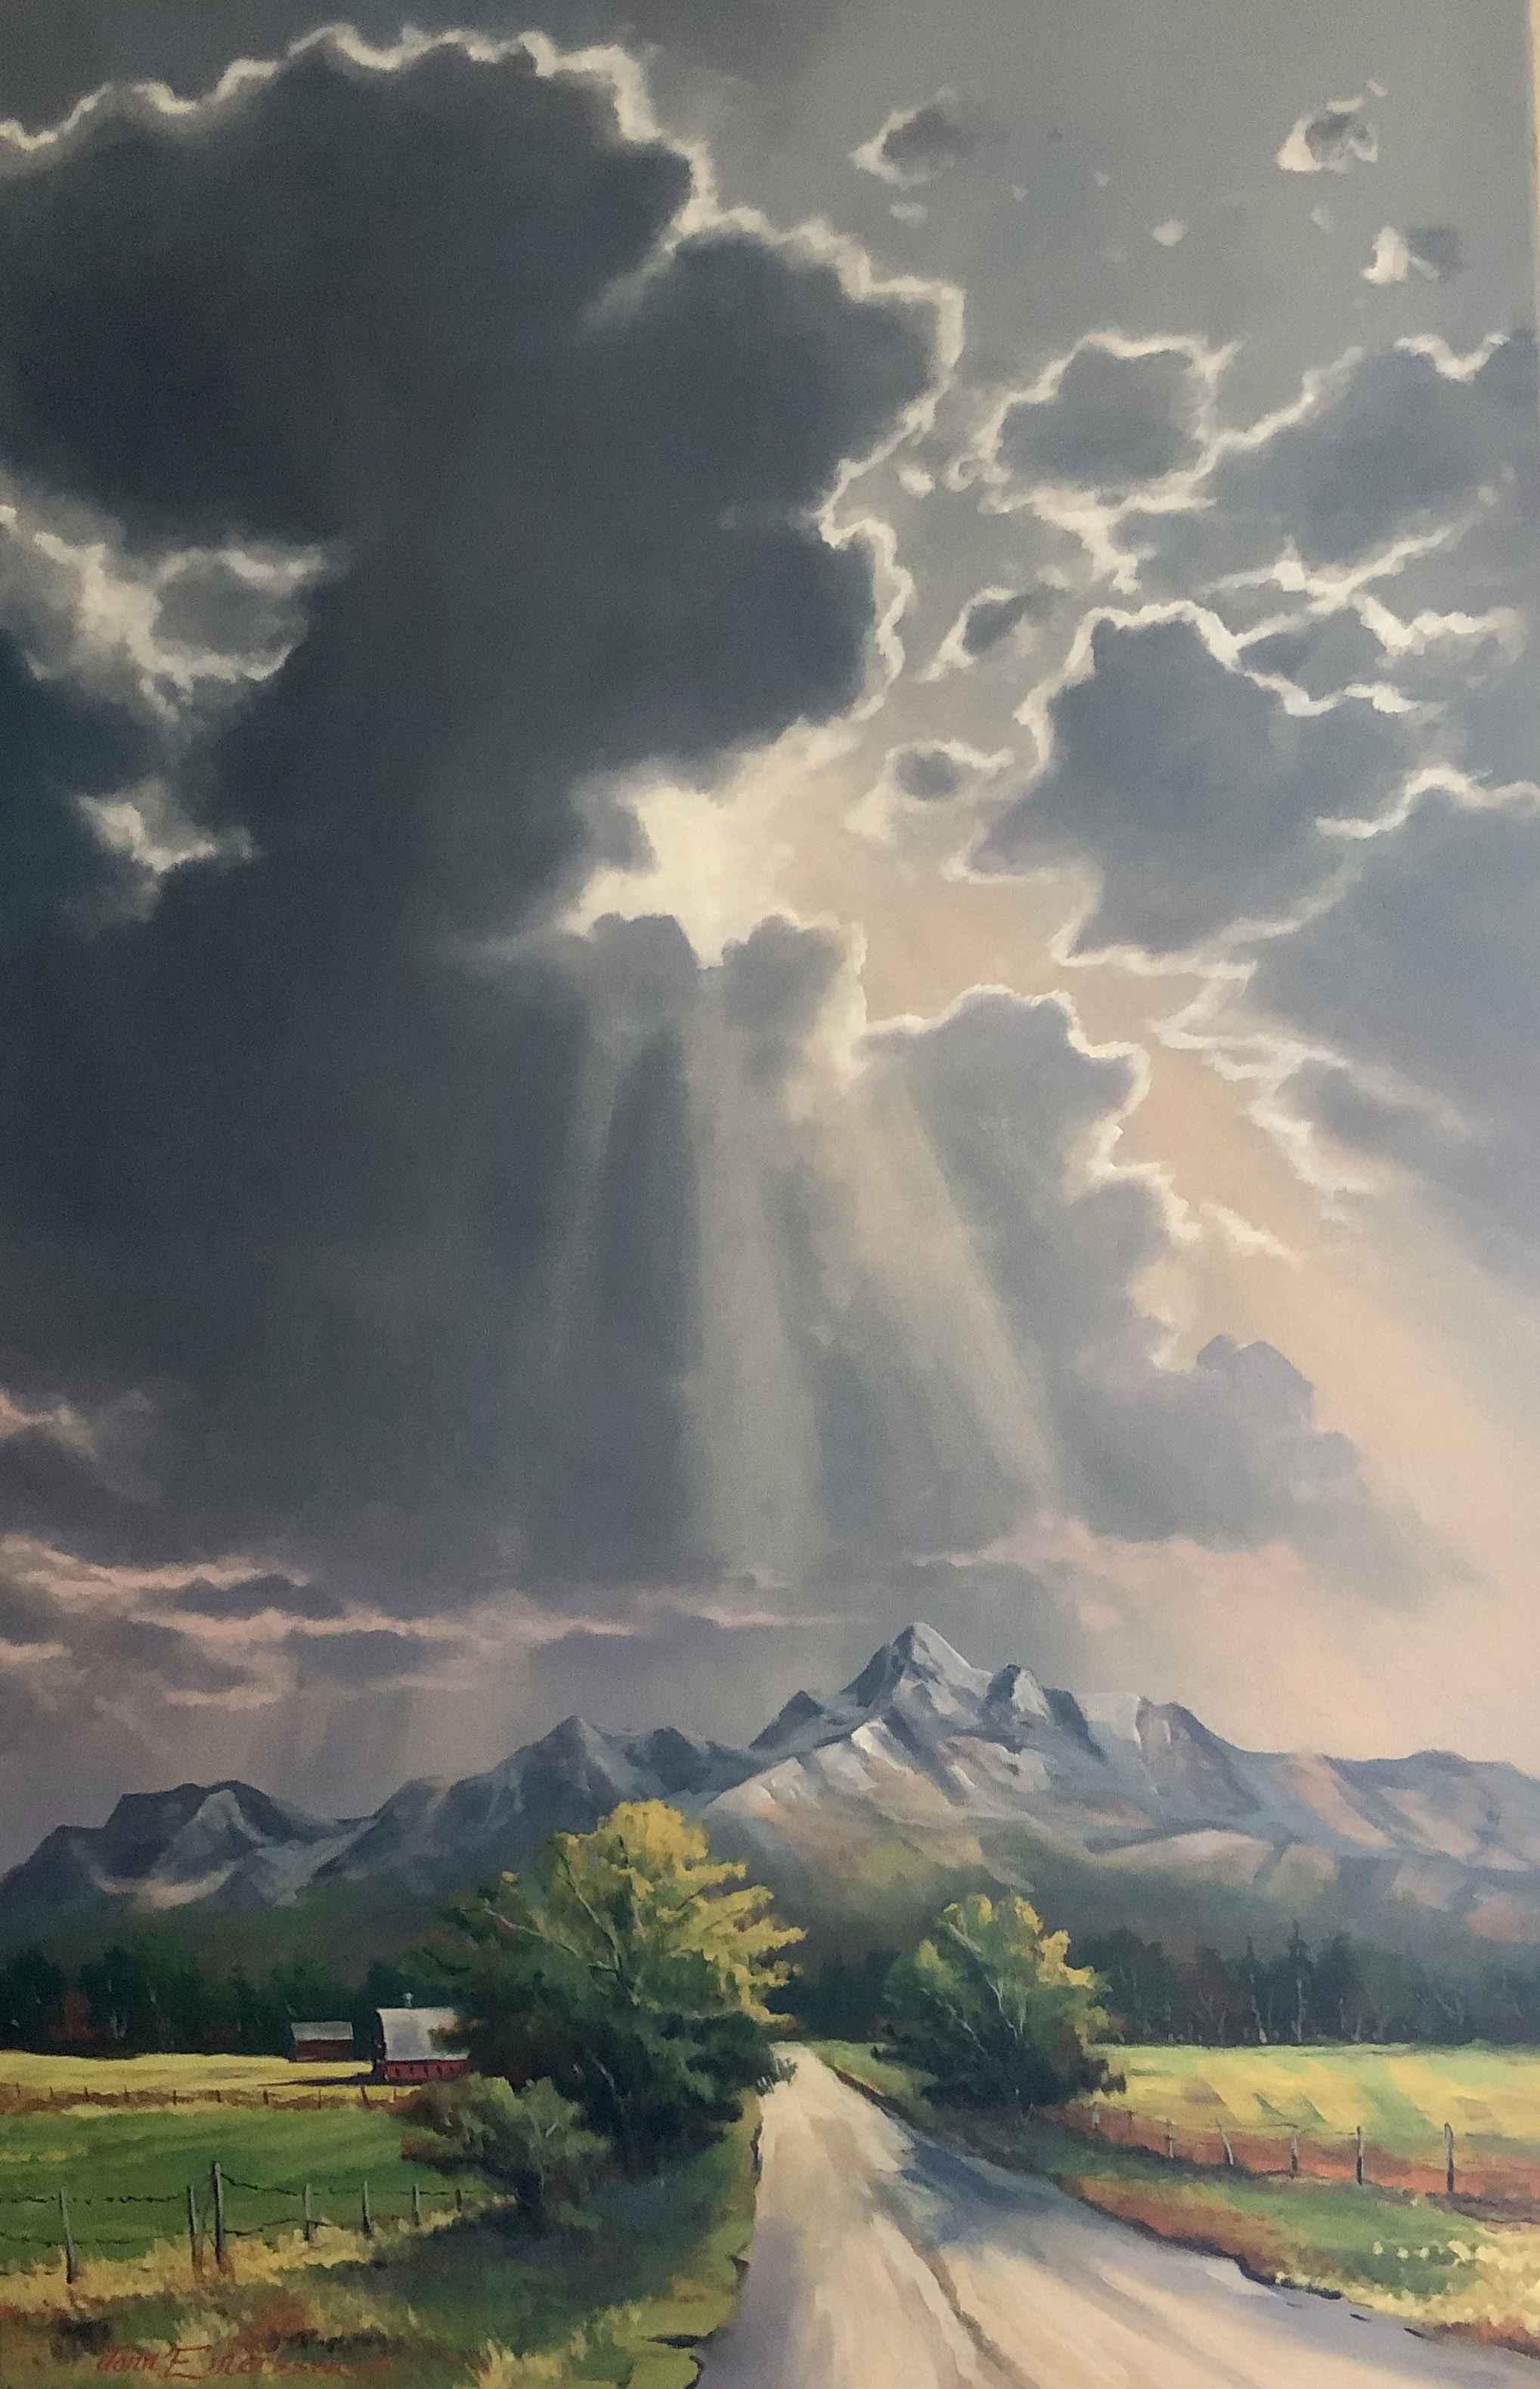 Ribbons of Light by  Jonn Einerssen - Masterpiece Online